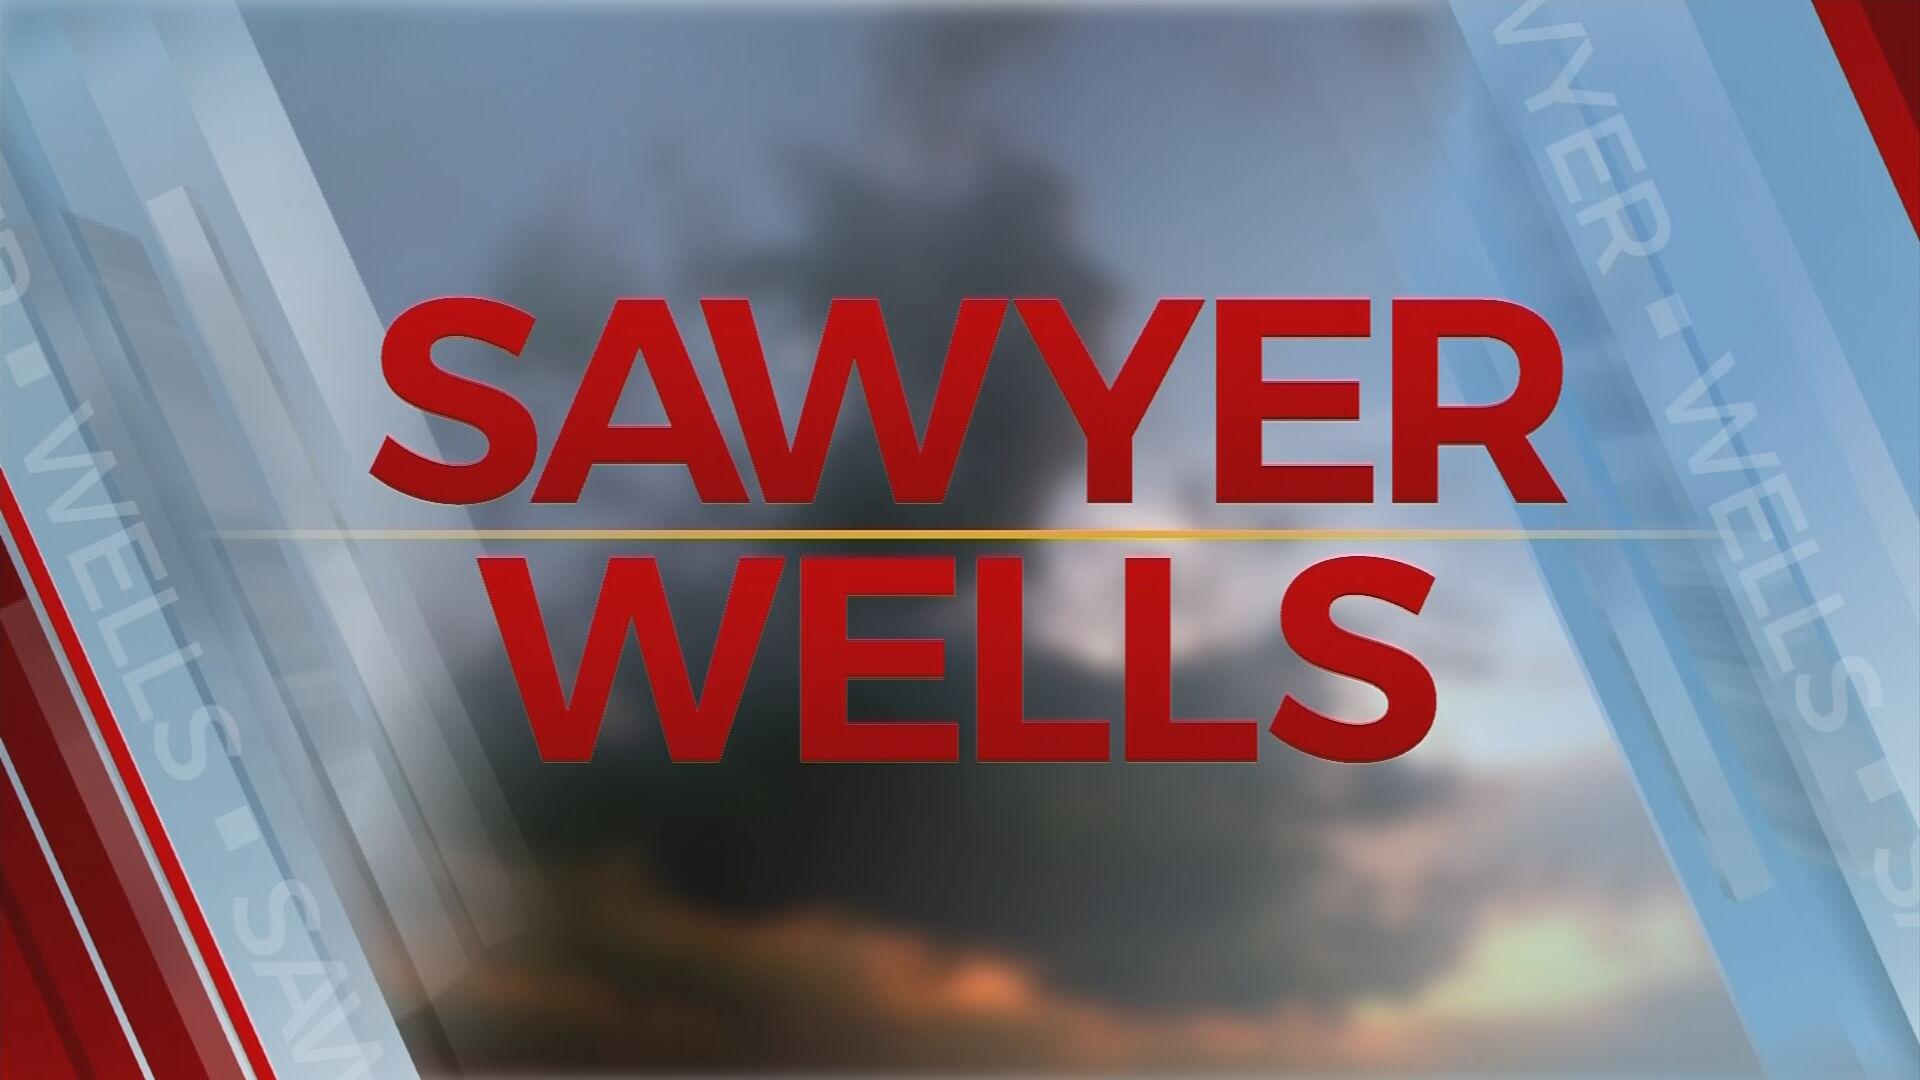 Friday Forecast With Sawyer Wells